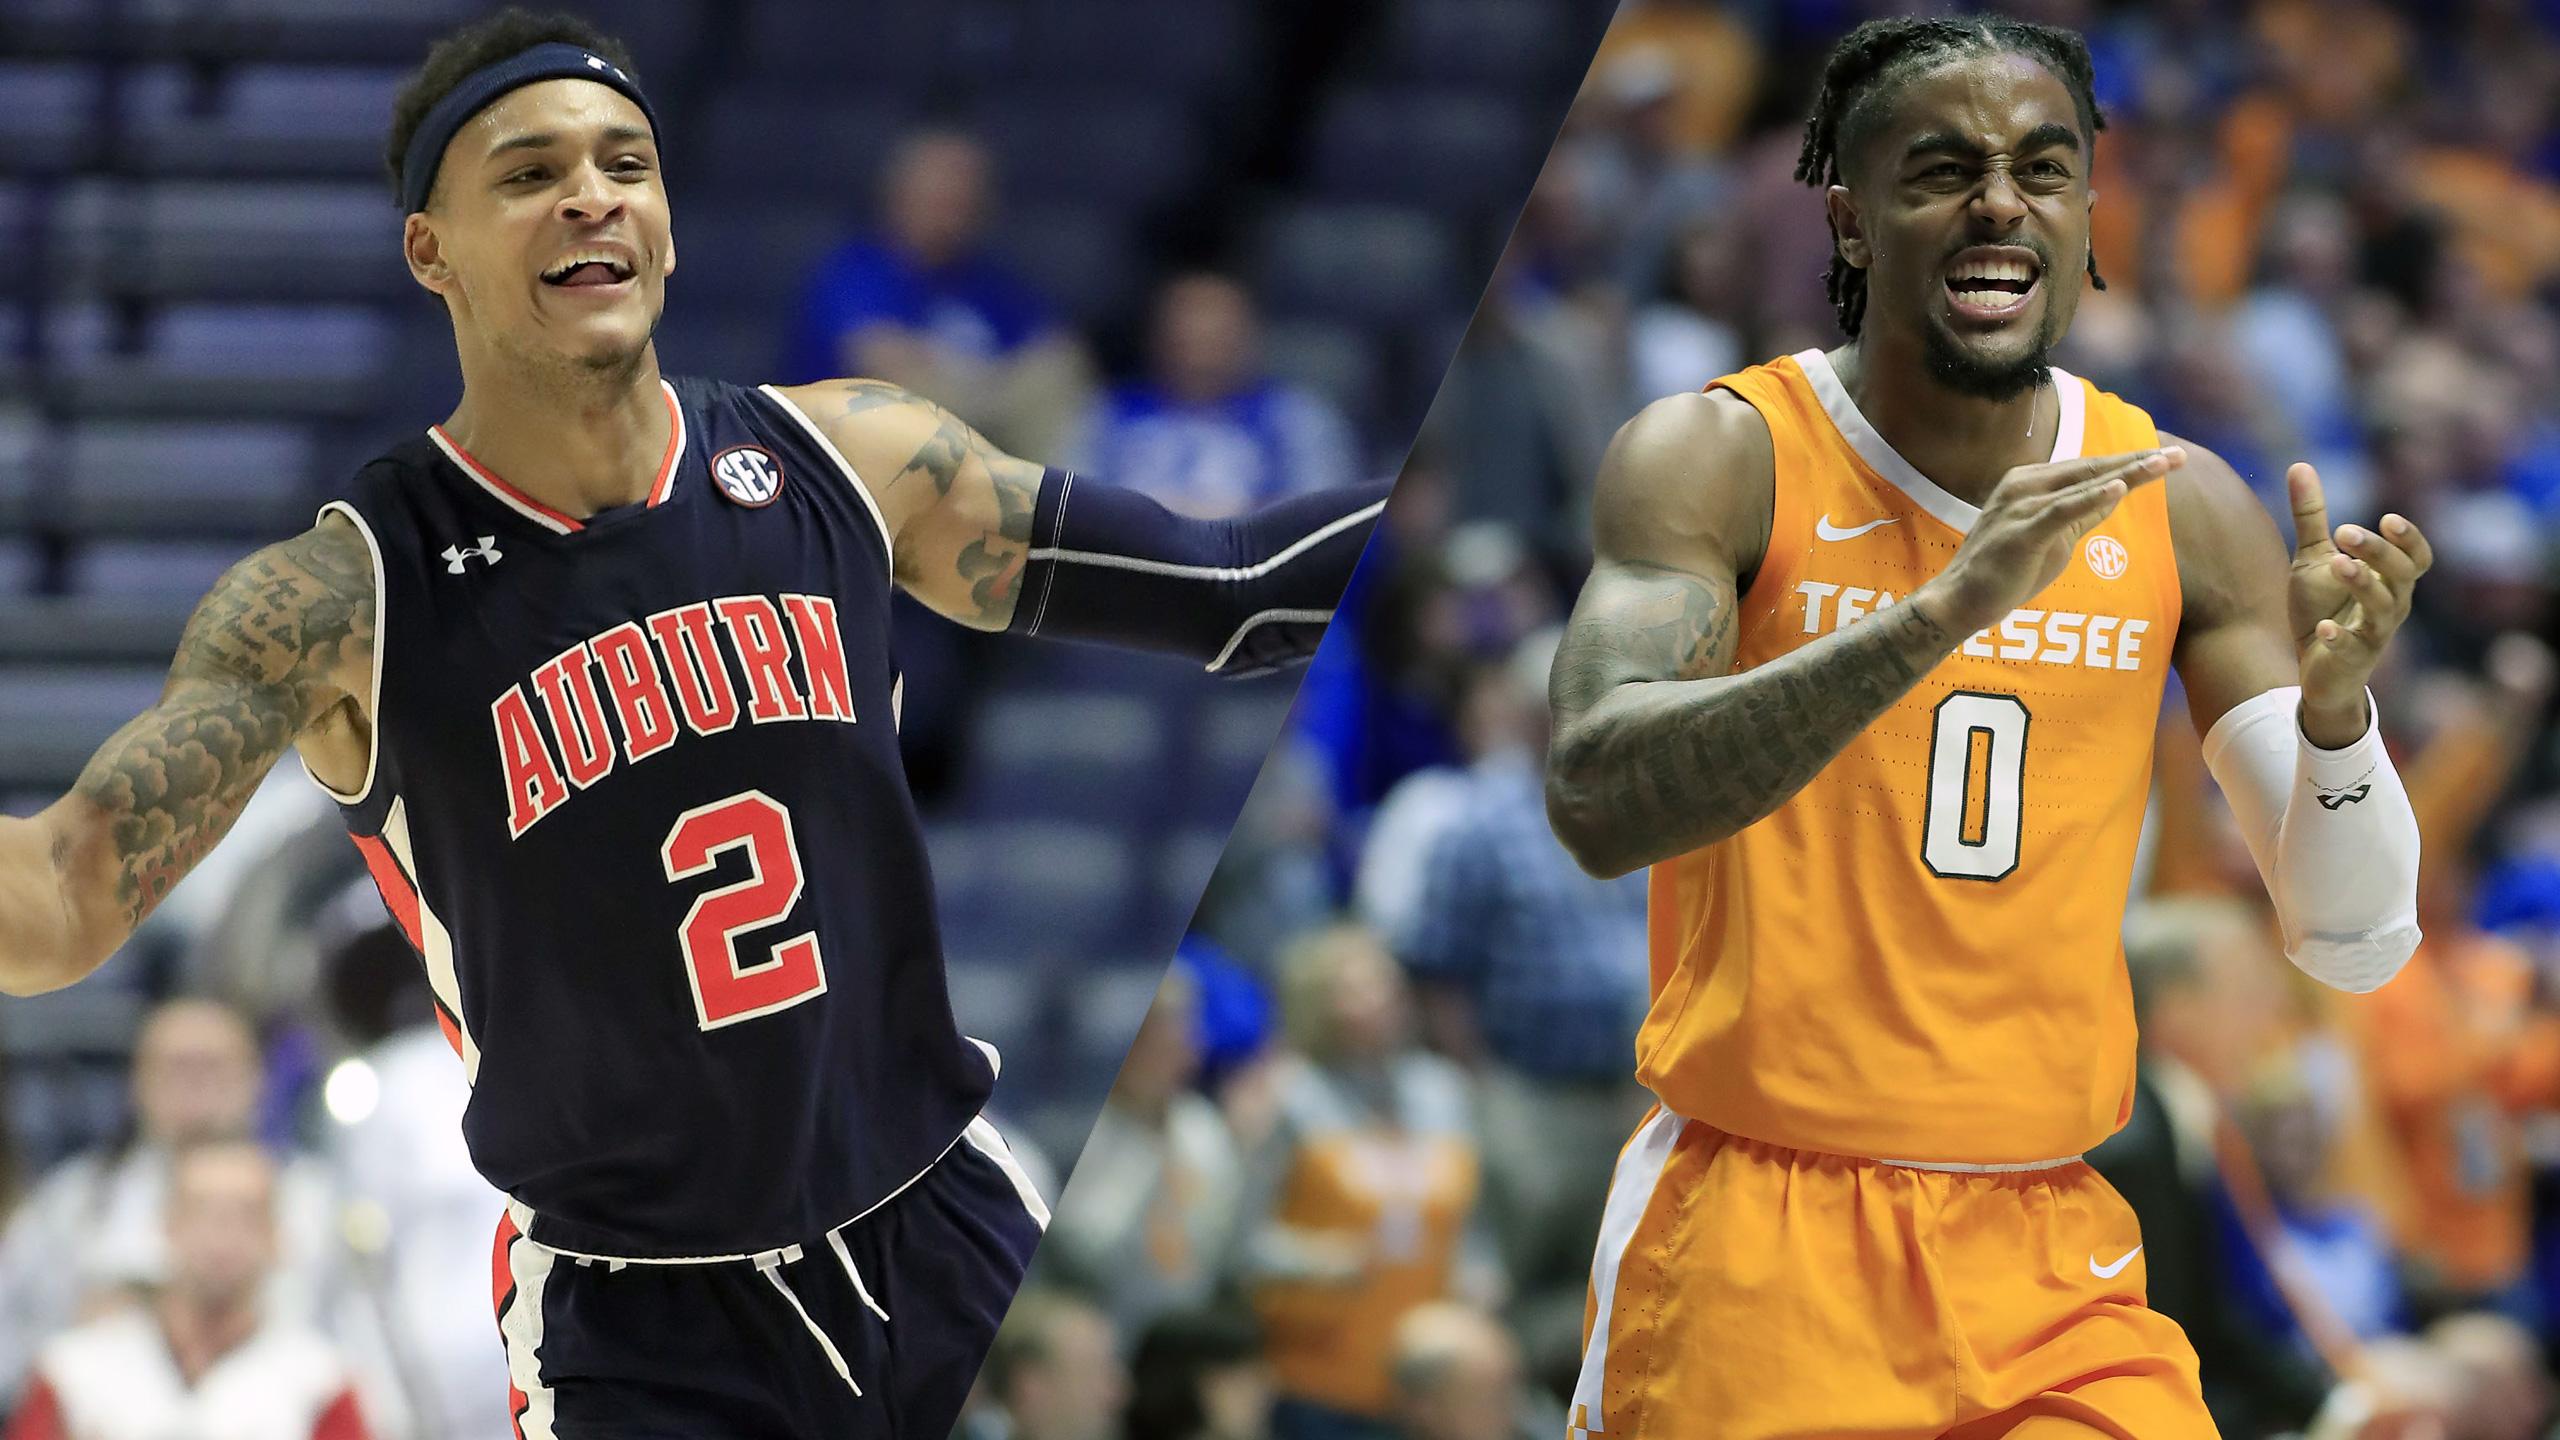 In Spanish - #22 Auburn vs. #8 Tennessee (Championship) (SEC Men's Basketball Tournament)